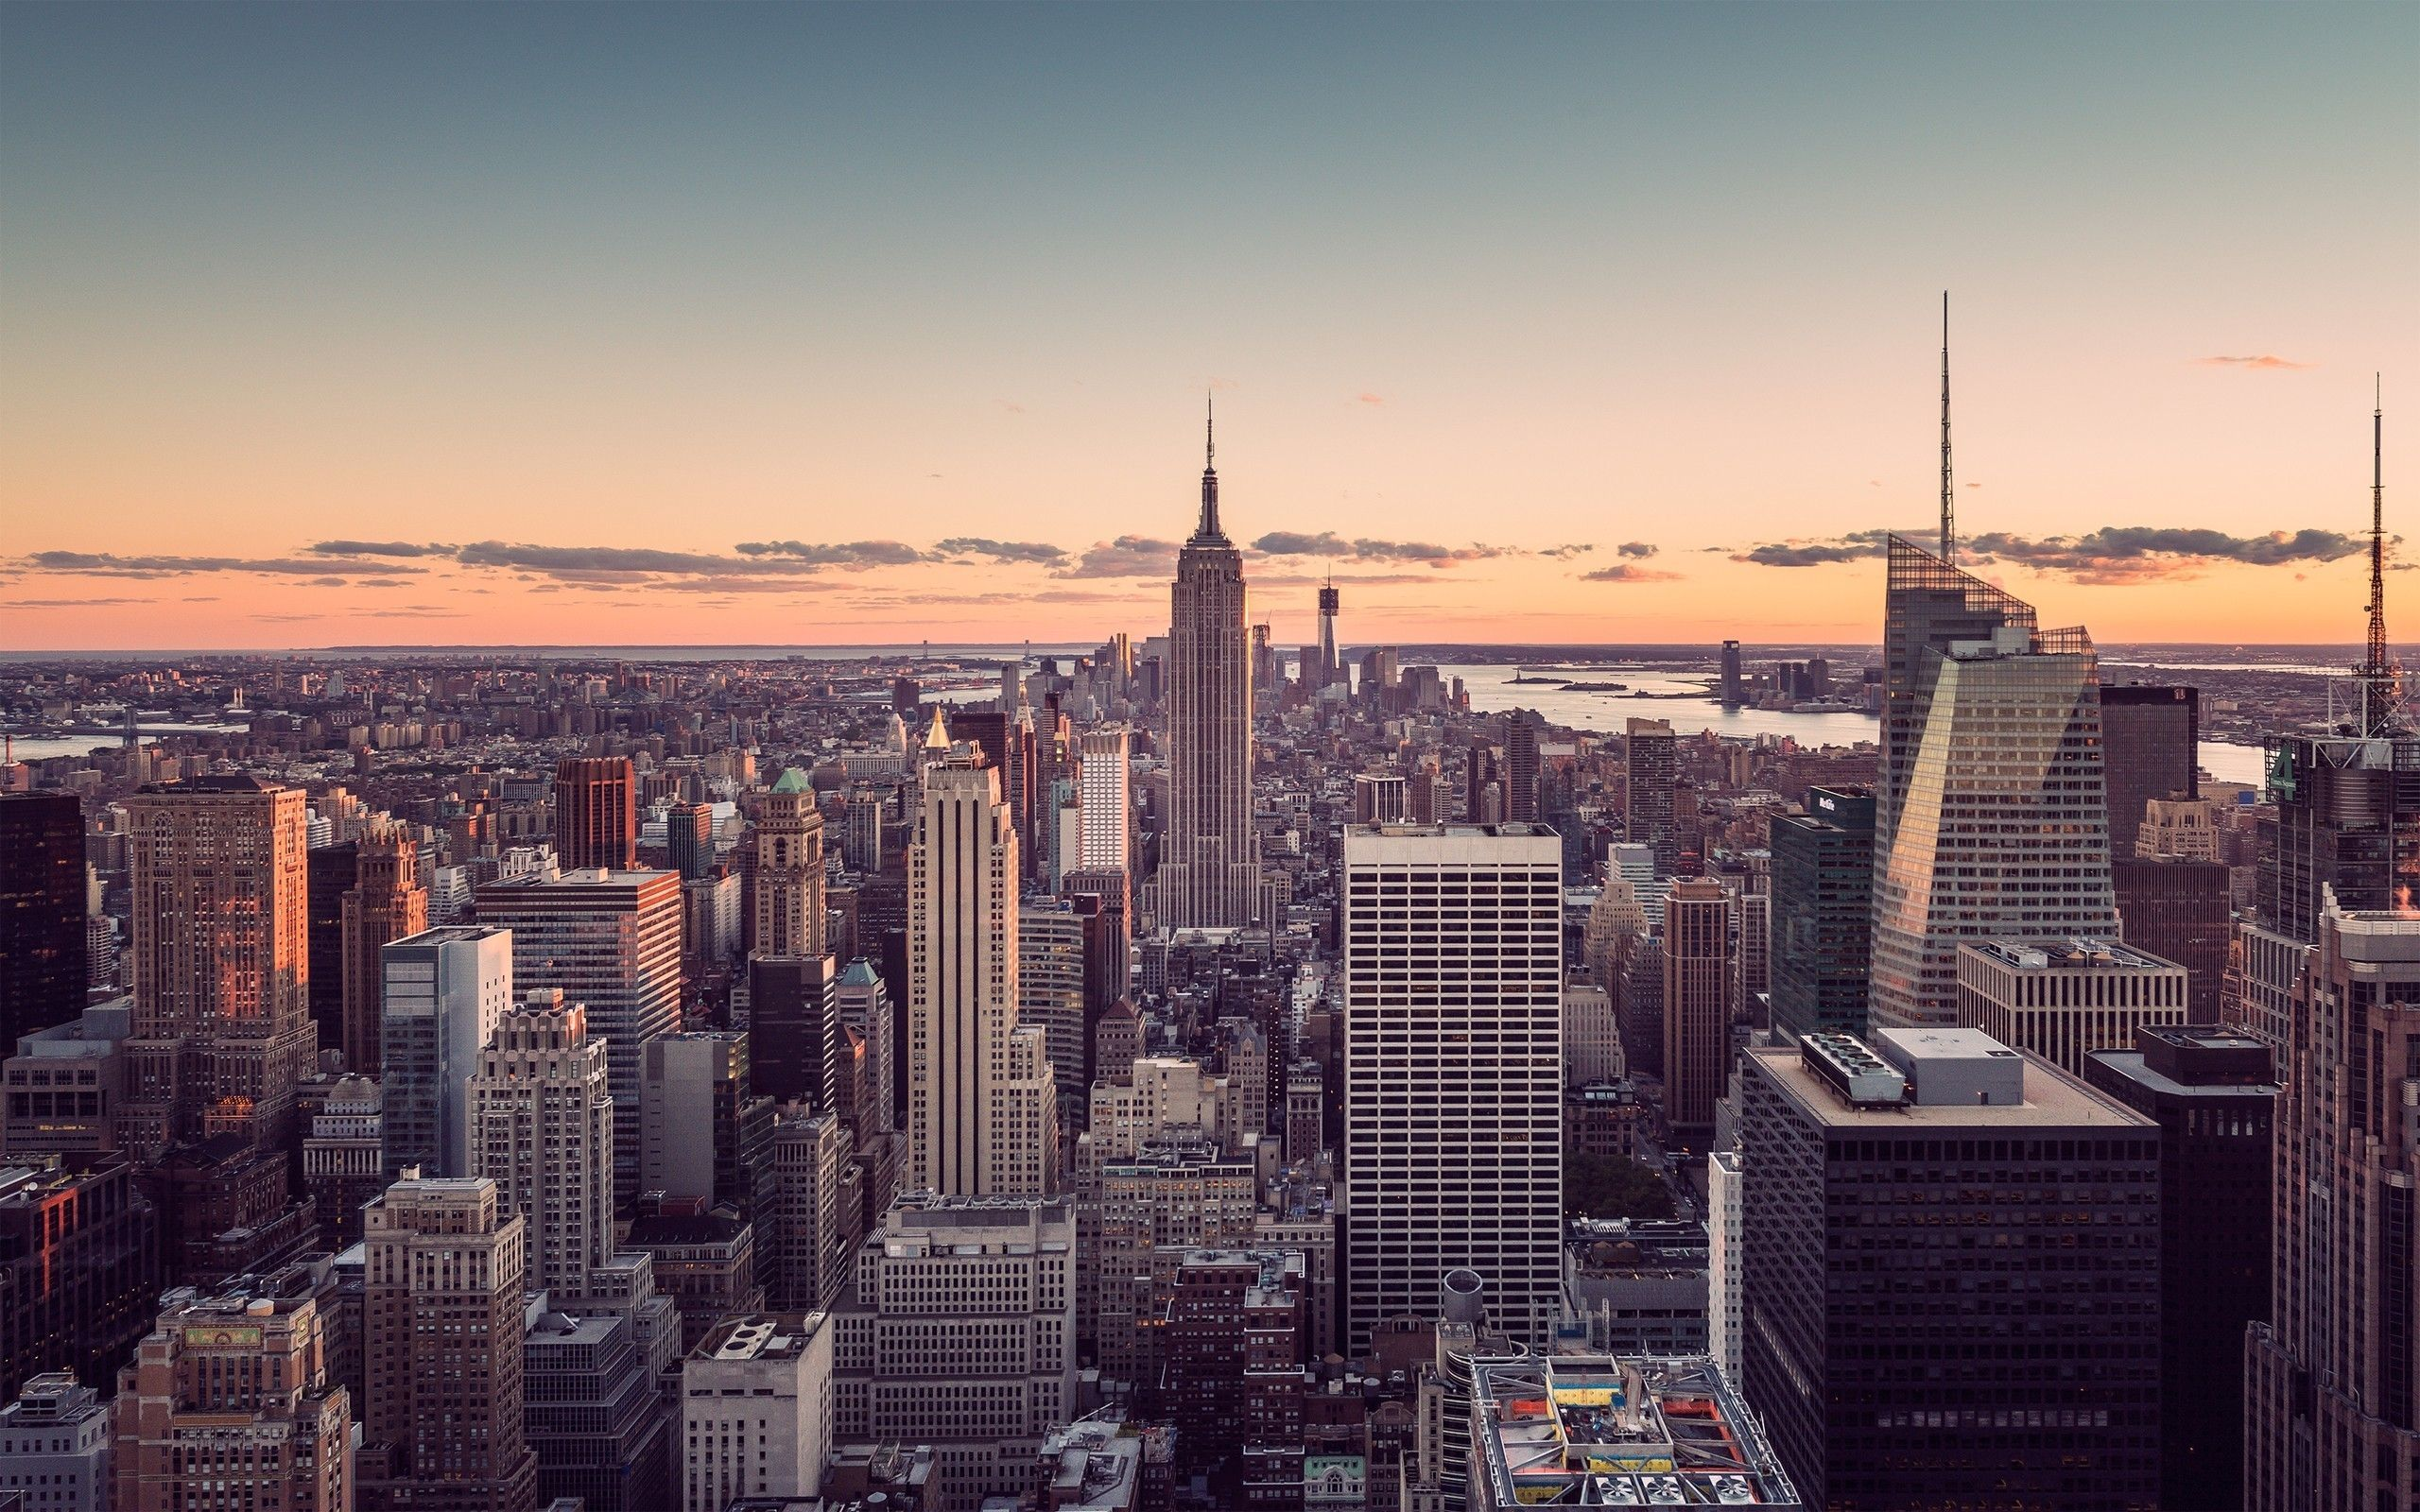 Wallpaper Backgrounds Pc Background New York Wallpaper Sunset City Desktop Images